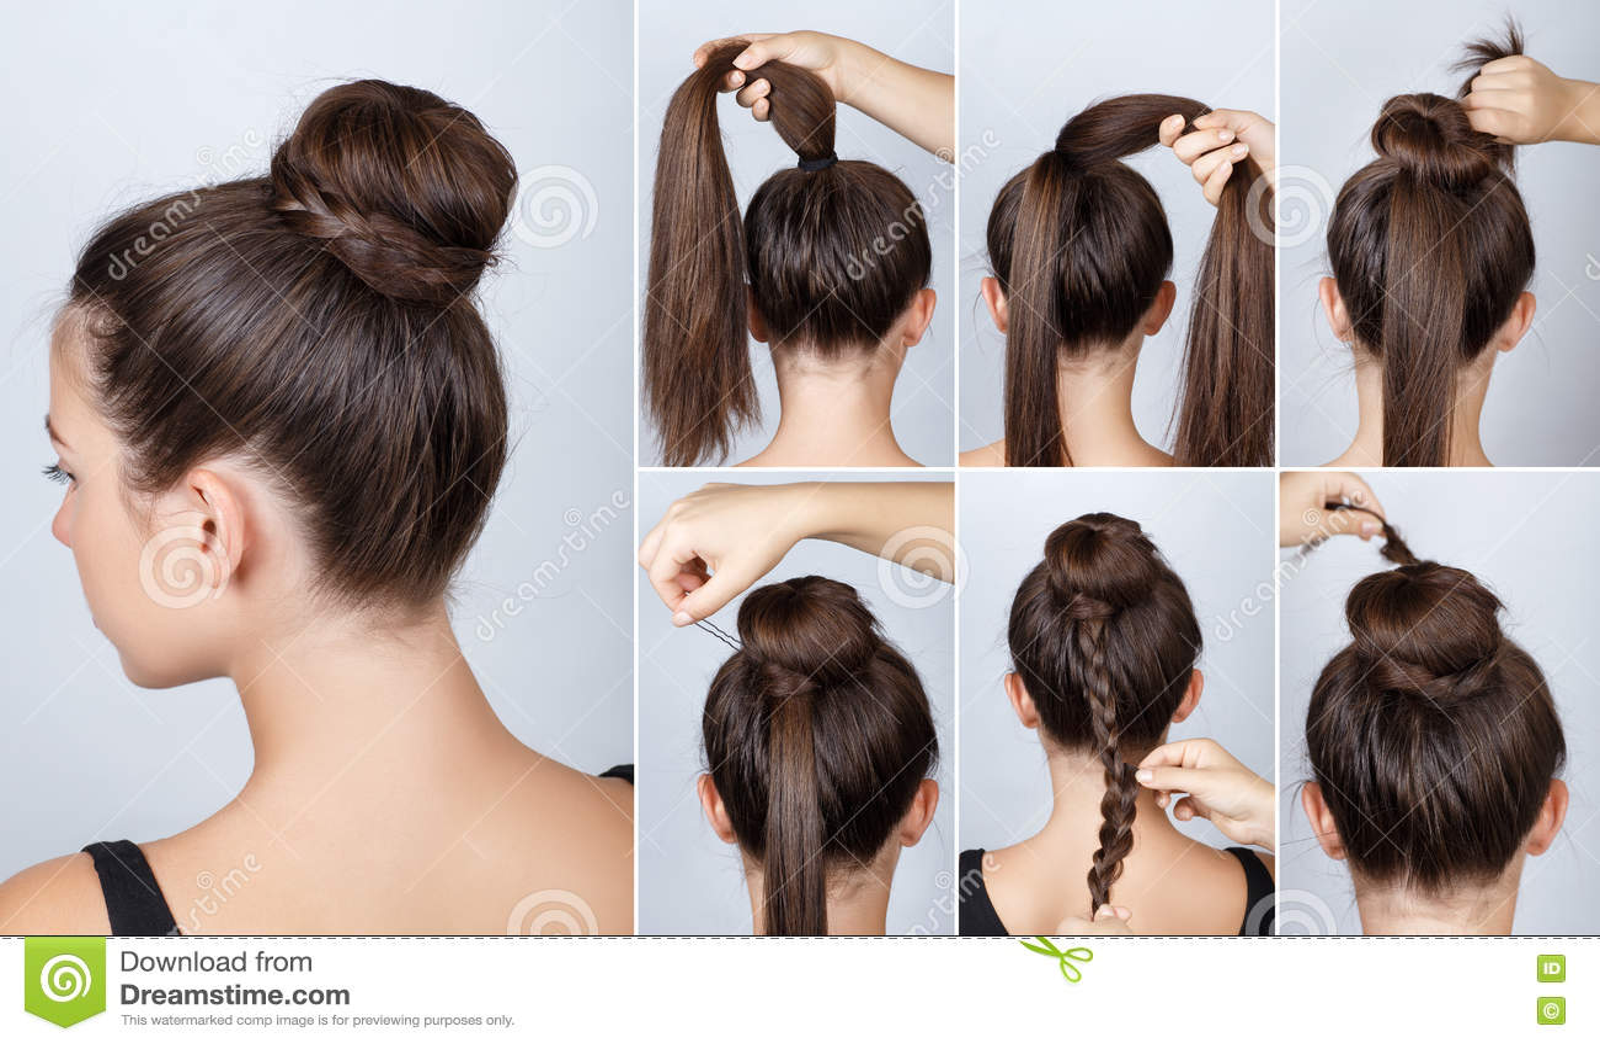 Hairstyle Tutorial Elegant Bun With Braid Stock Image ...